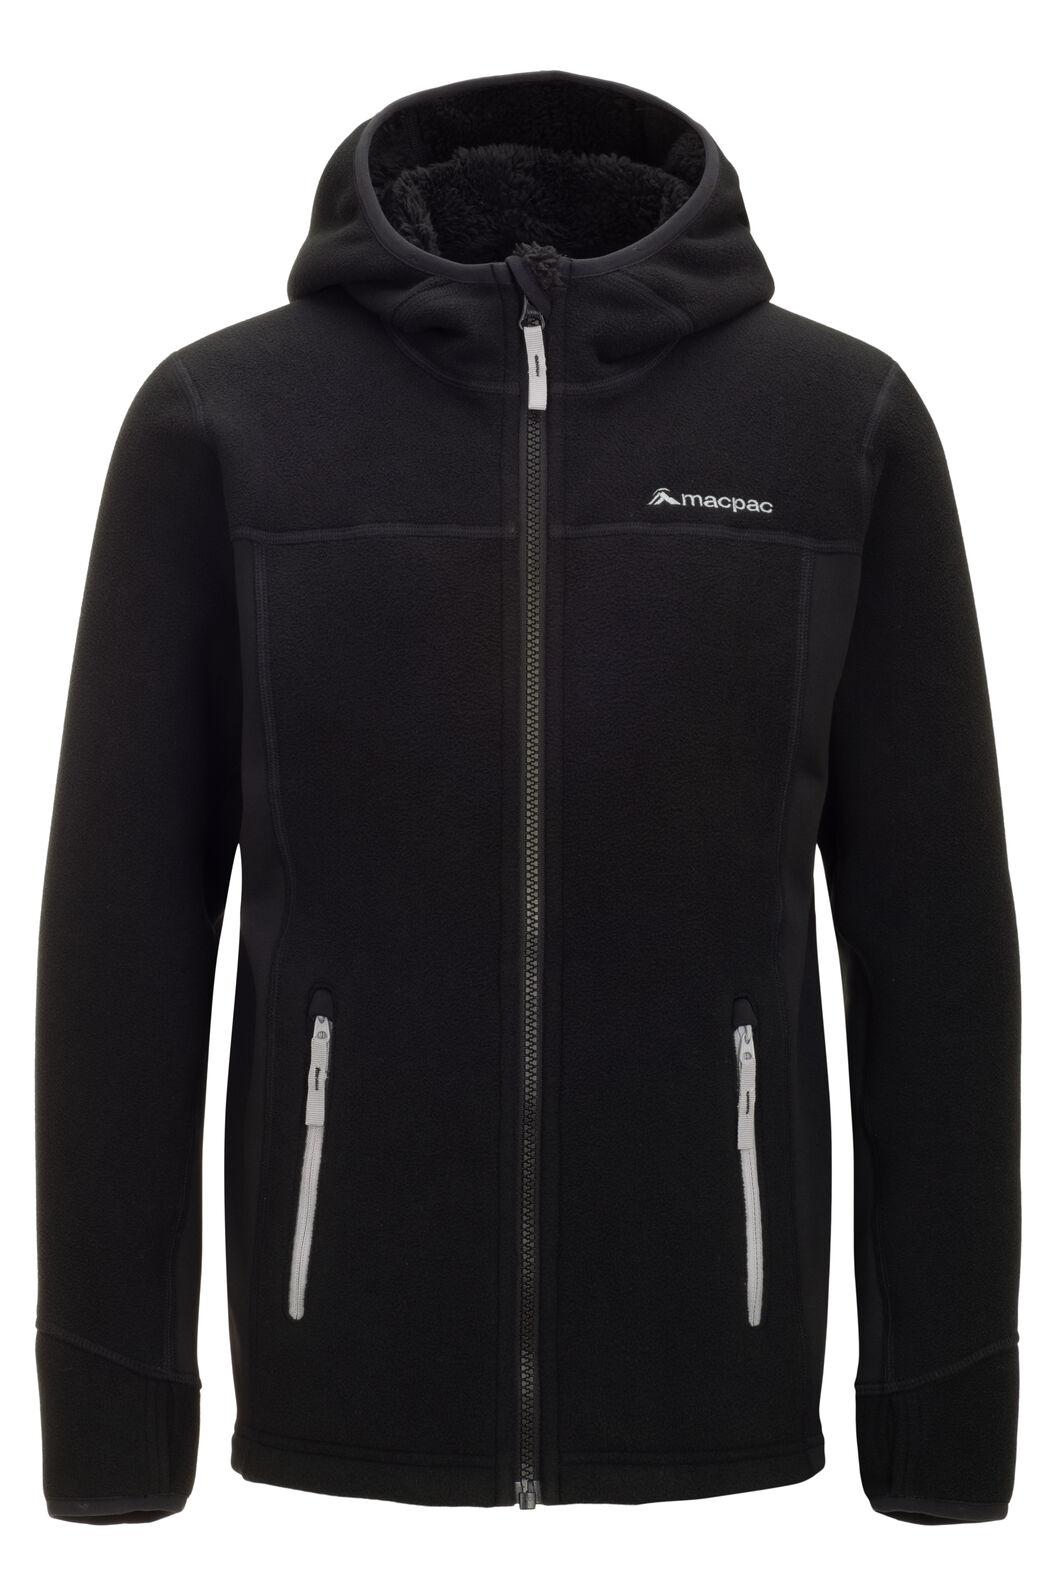 Macpac Mini Mountain Hooded Jacket — Kids', Black/High RIse, hi-res